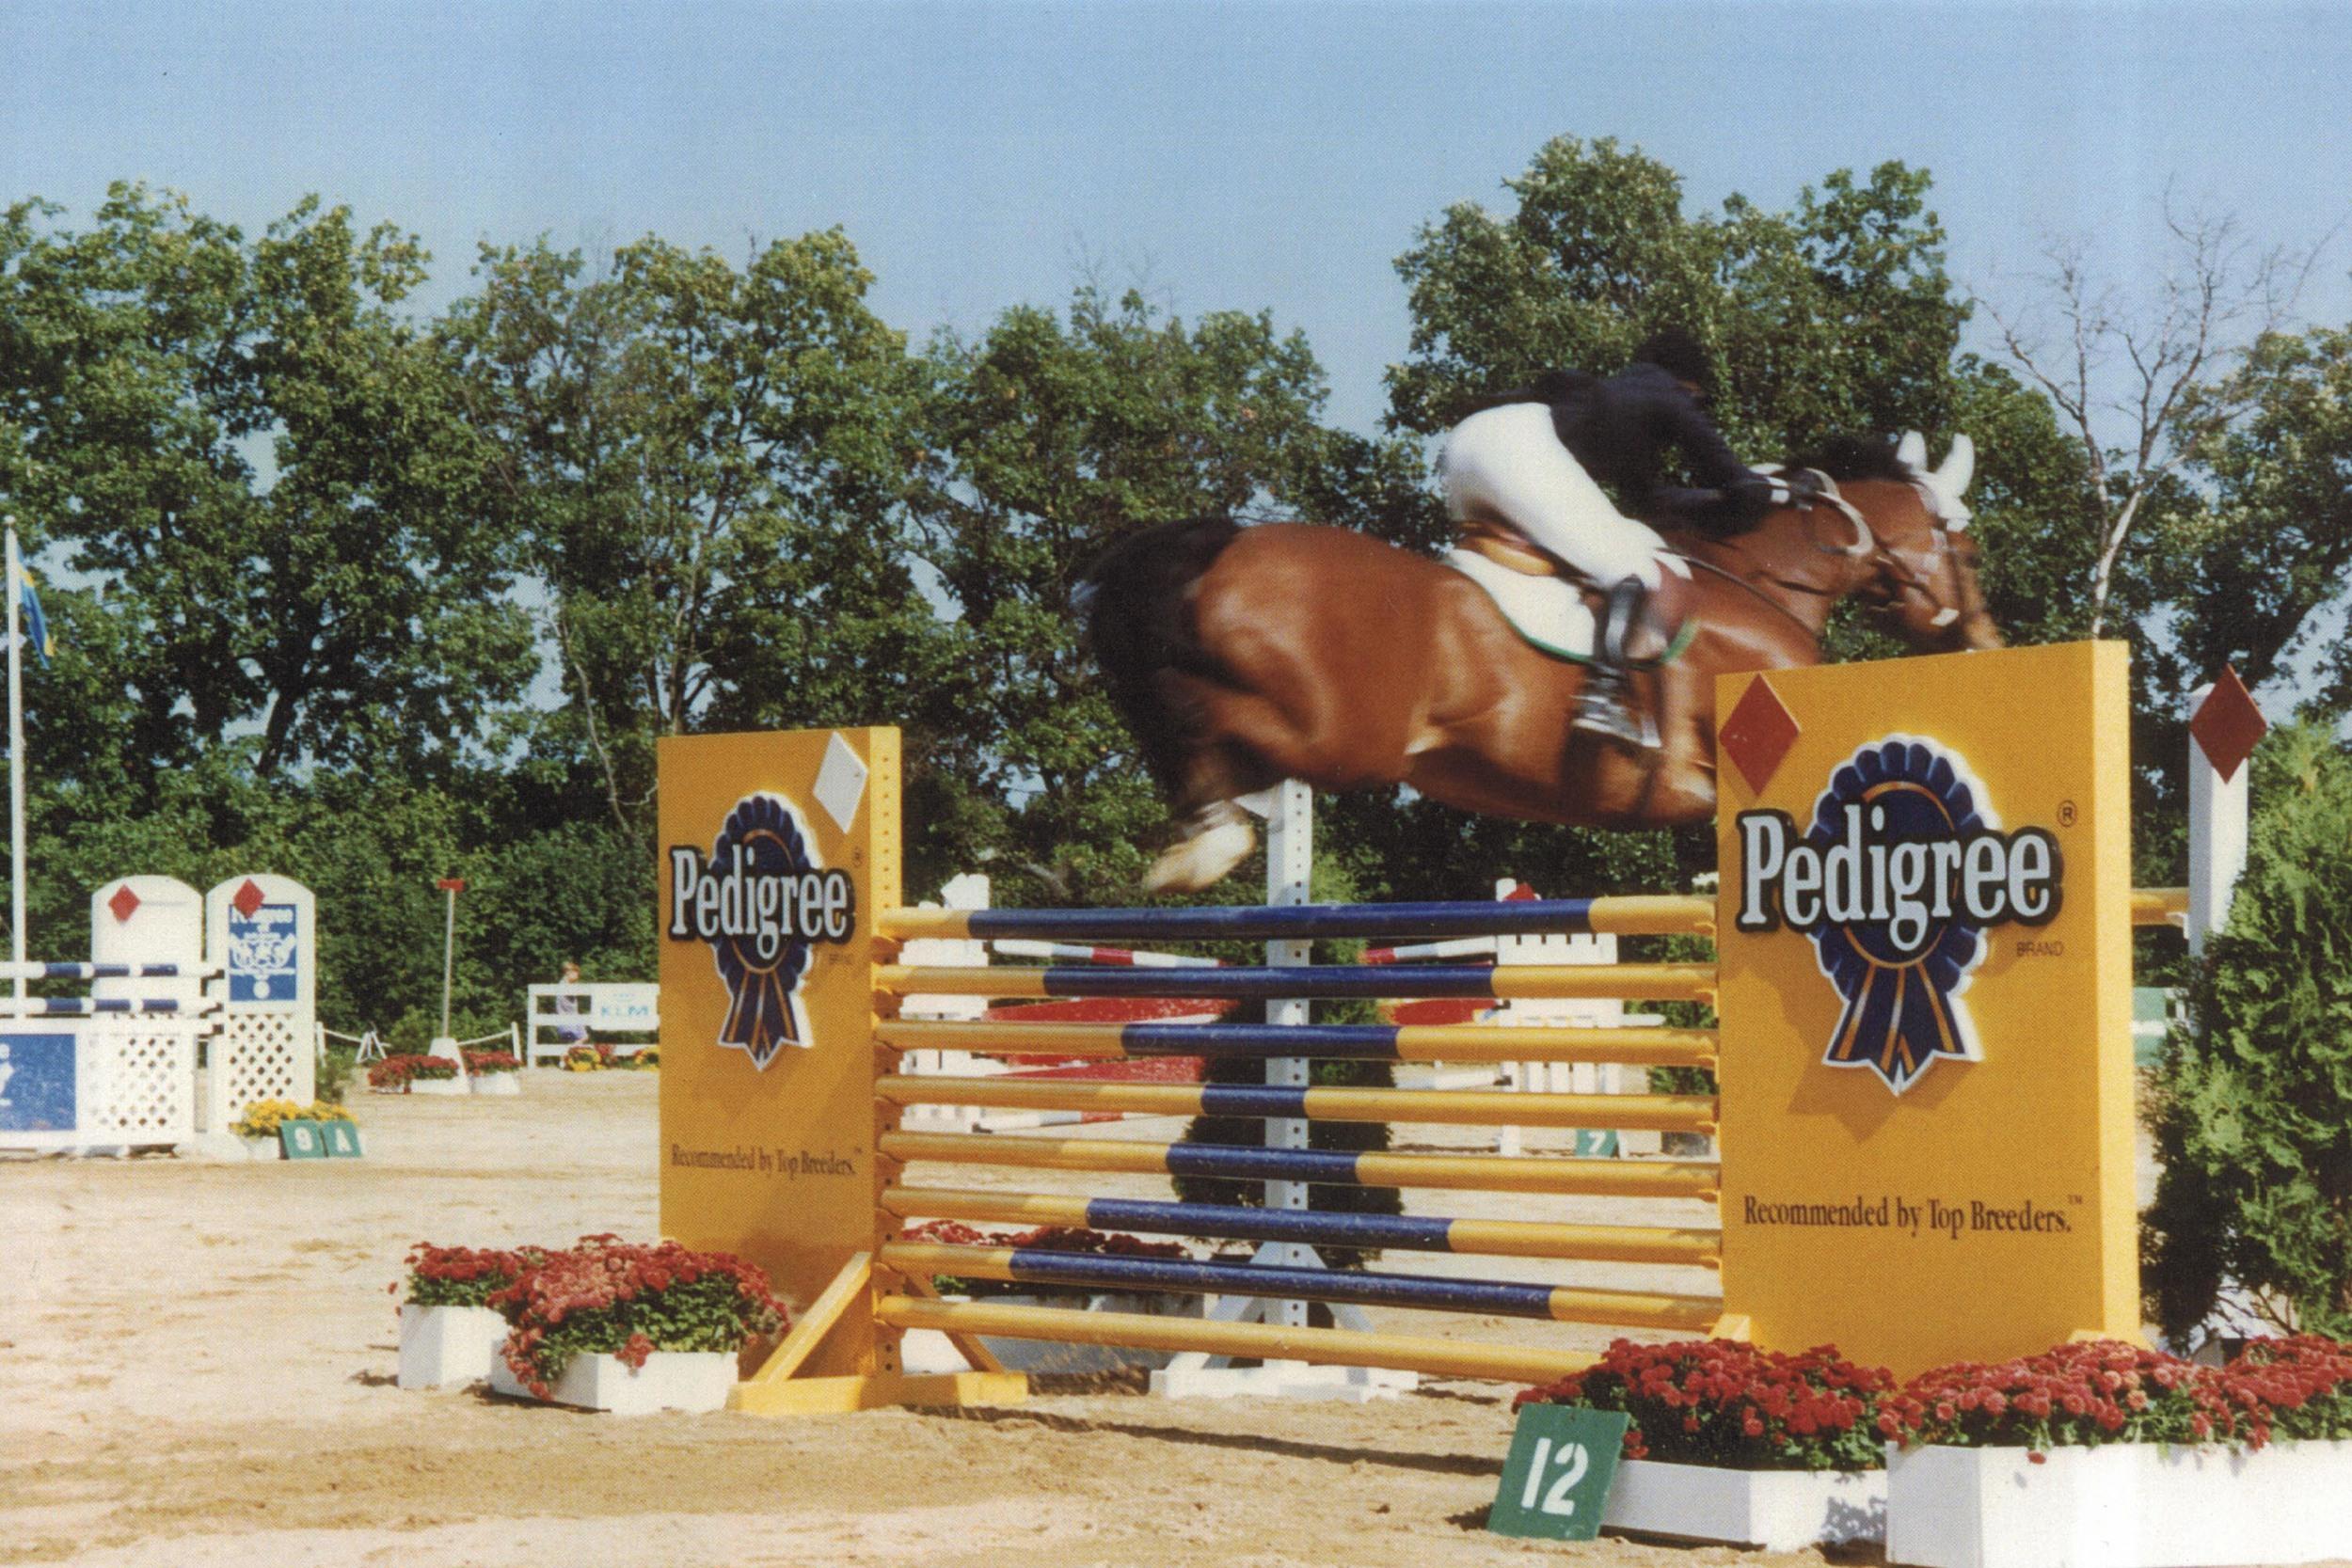 Pedigree Olympic Jump